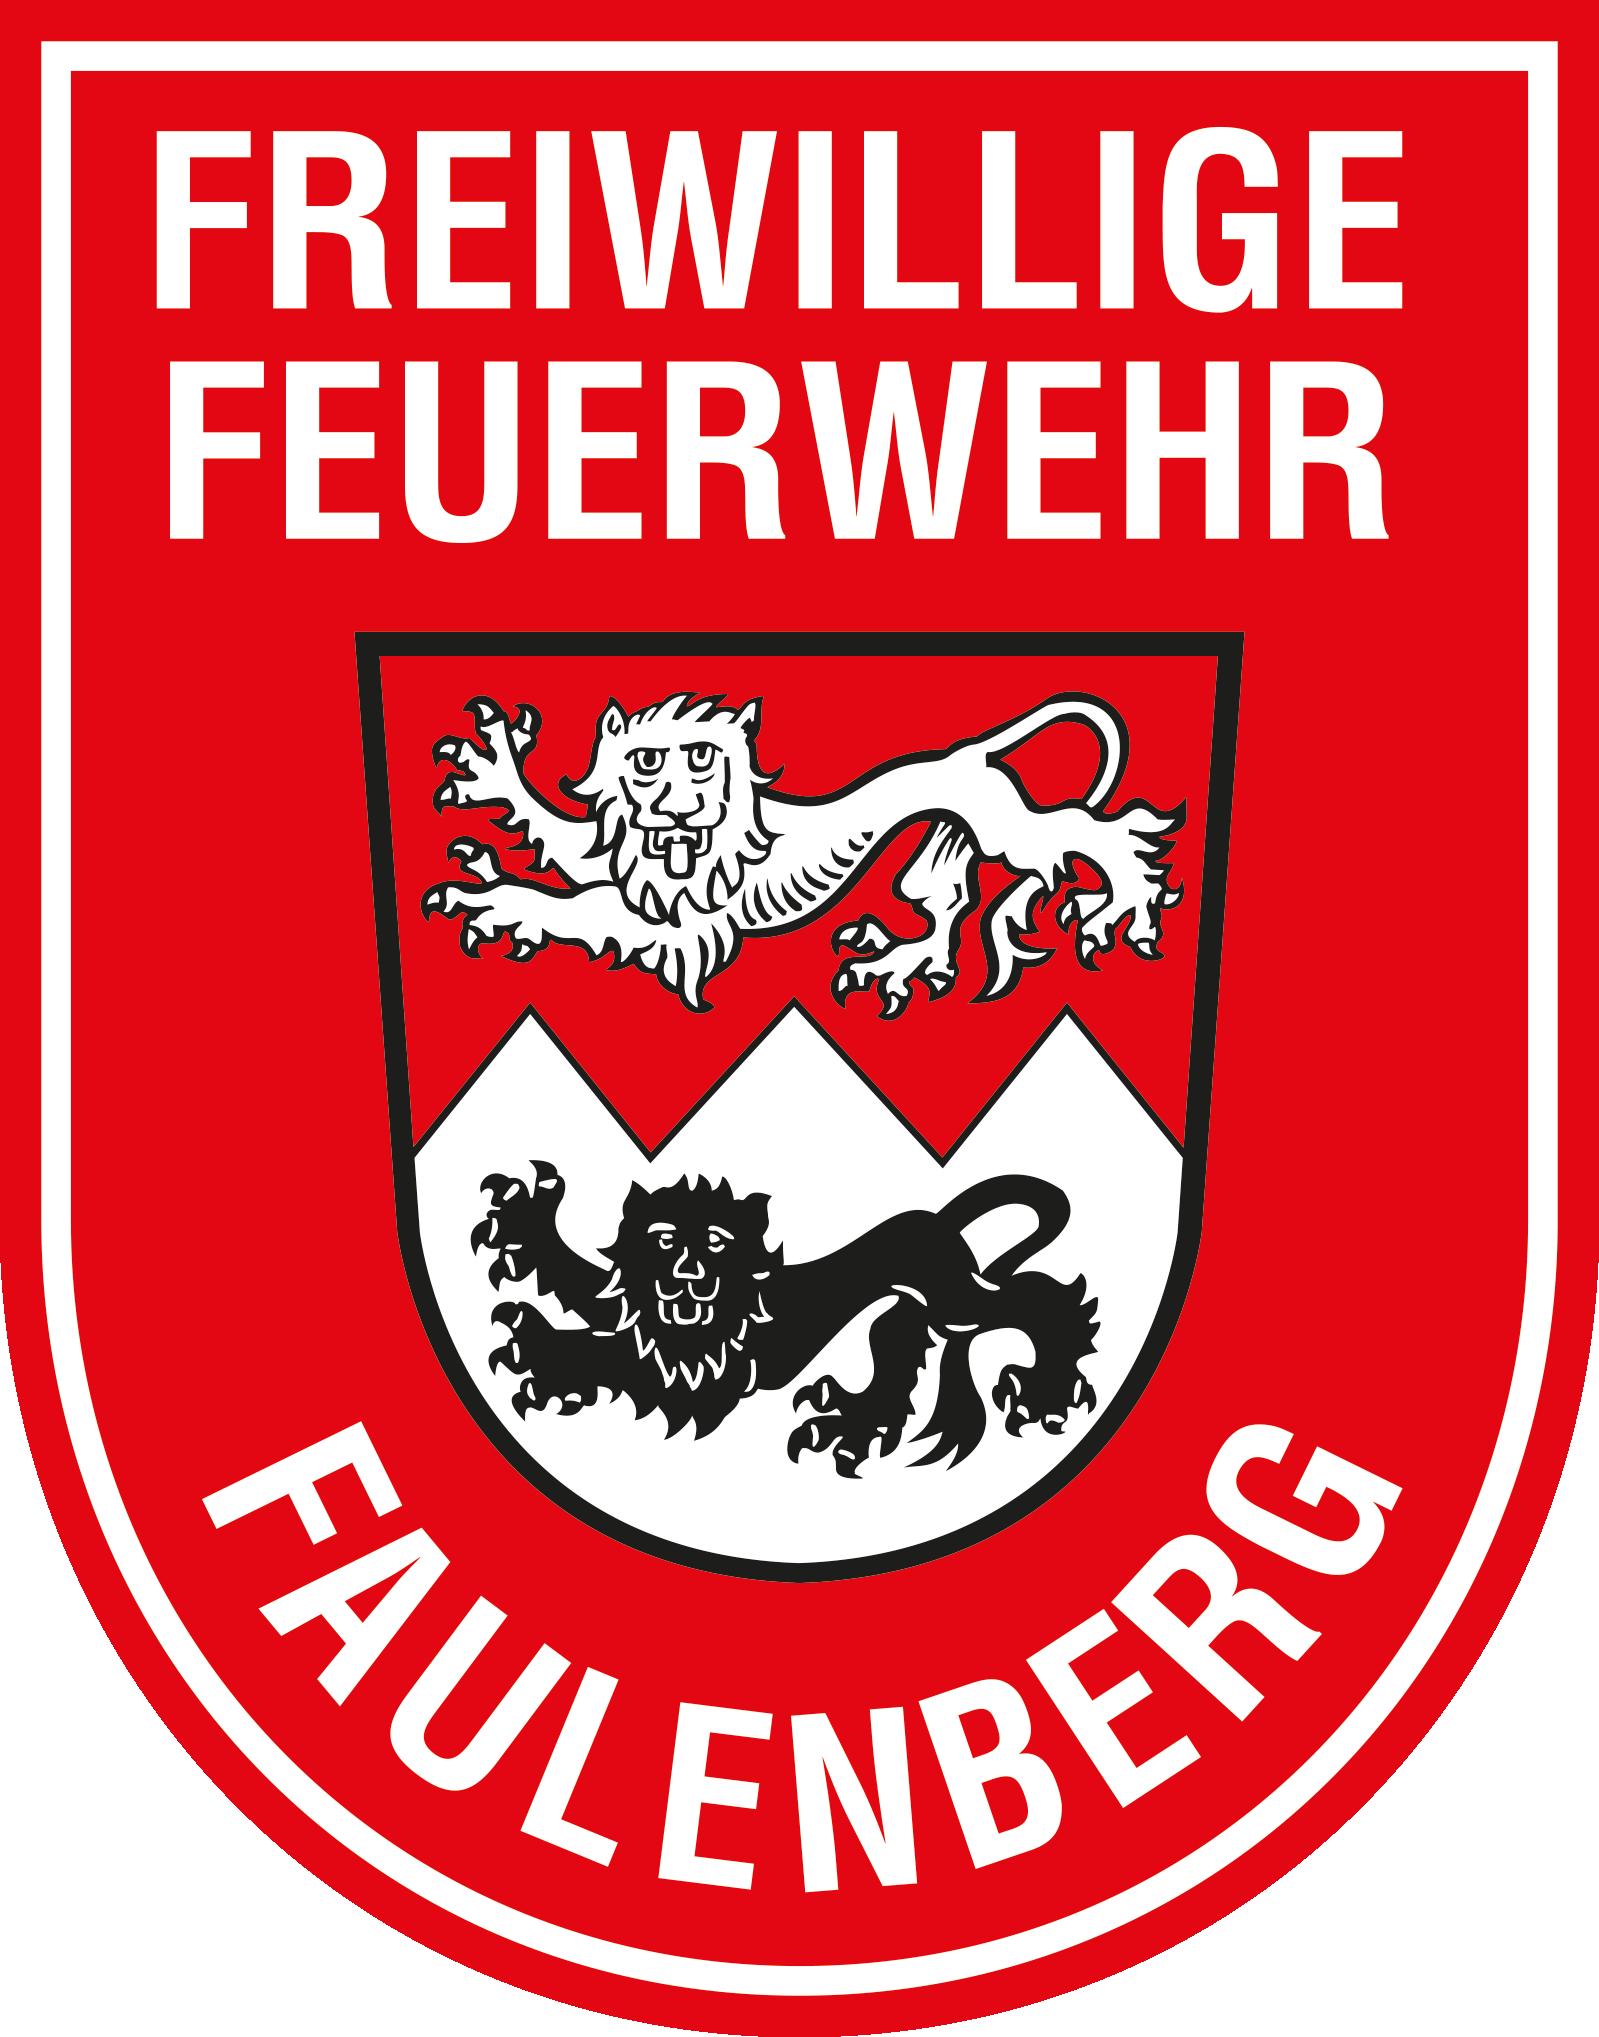 Feuerwehr Faulenberg